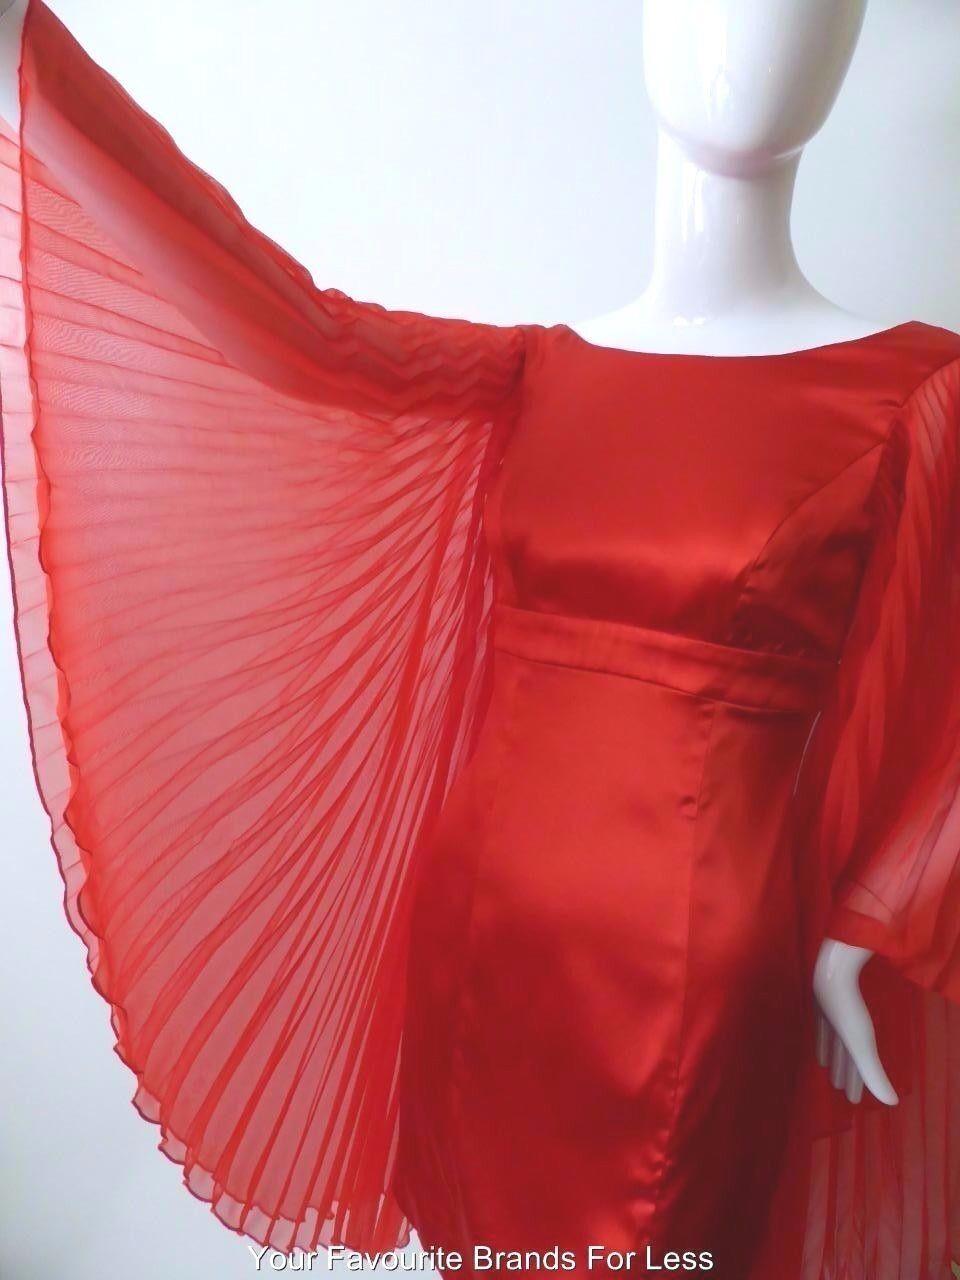 GUESS AV MARCIANO Woherrar kort Dress NWT rrp  499 Storlek små Long Slieve Silk